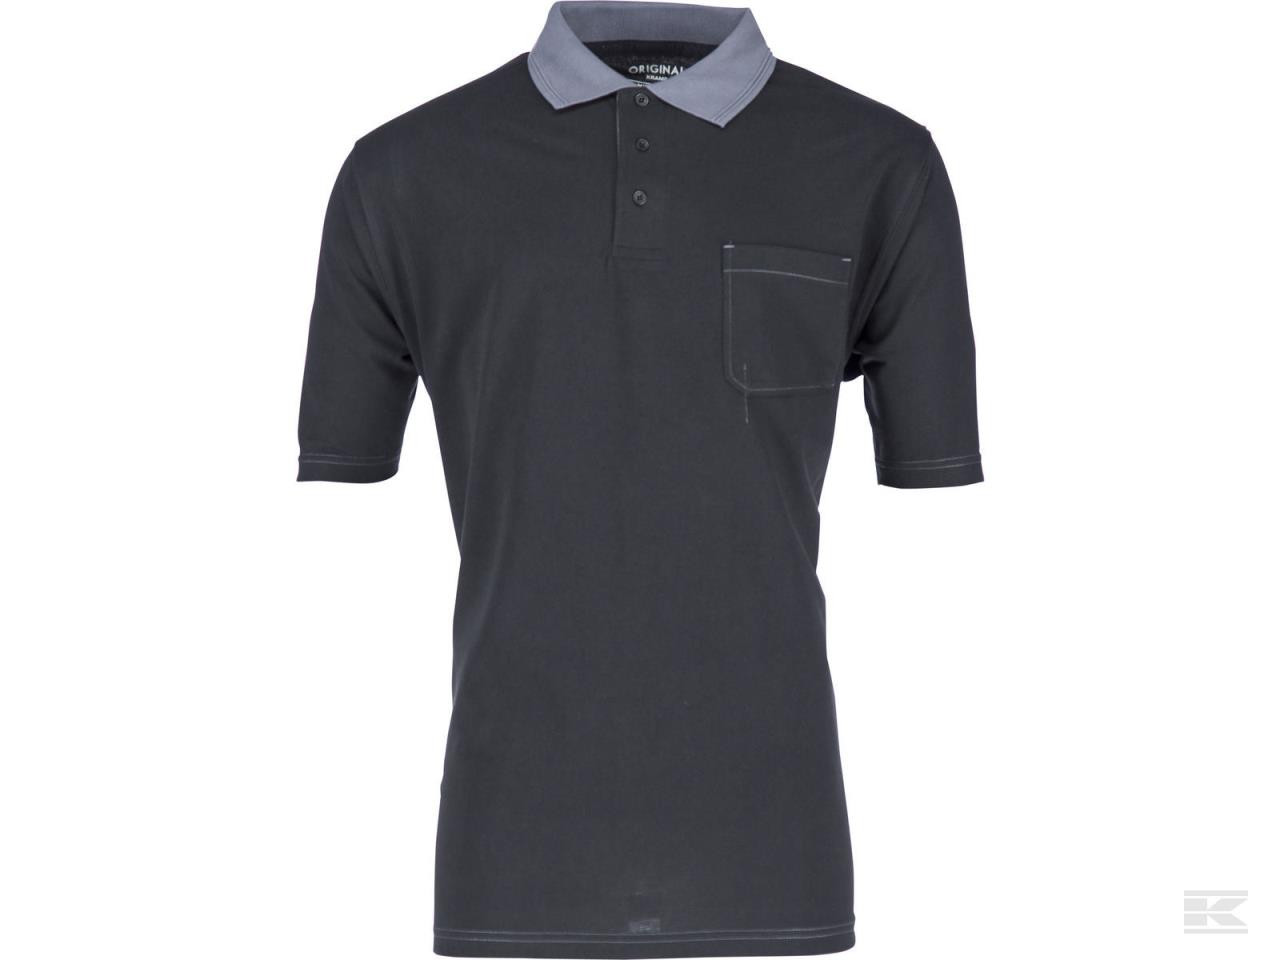 Polo T-shirt Original sort/grå